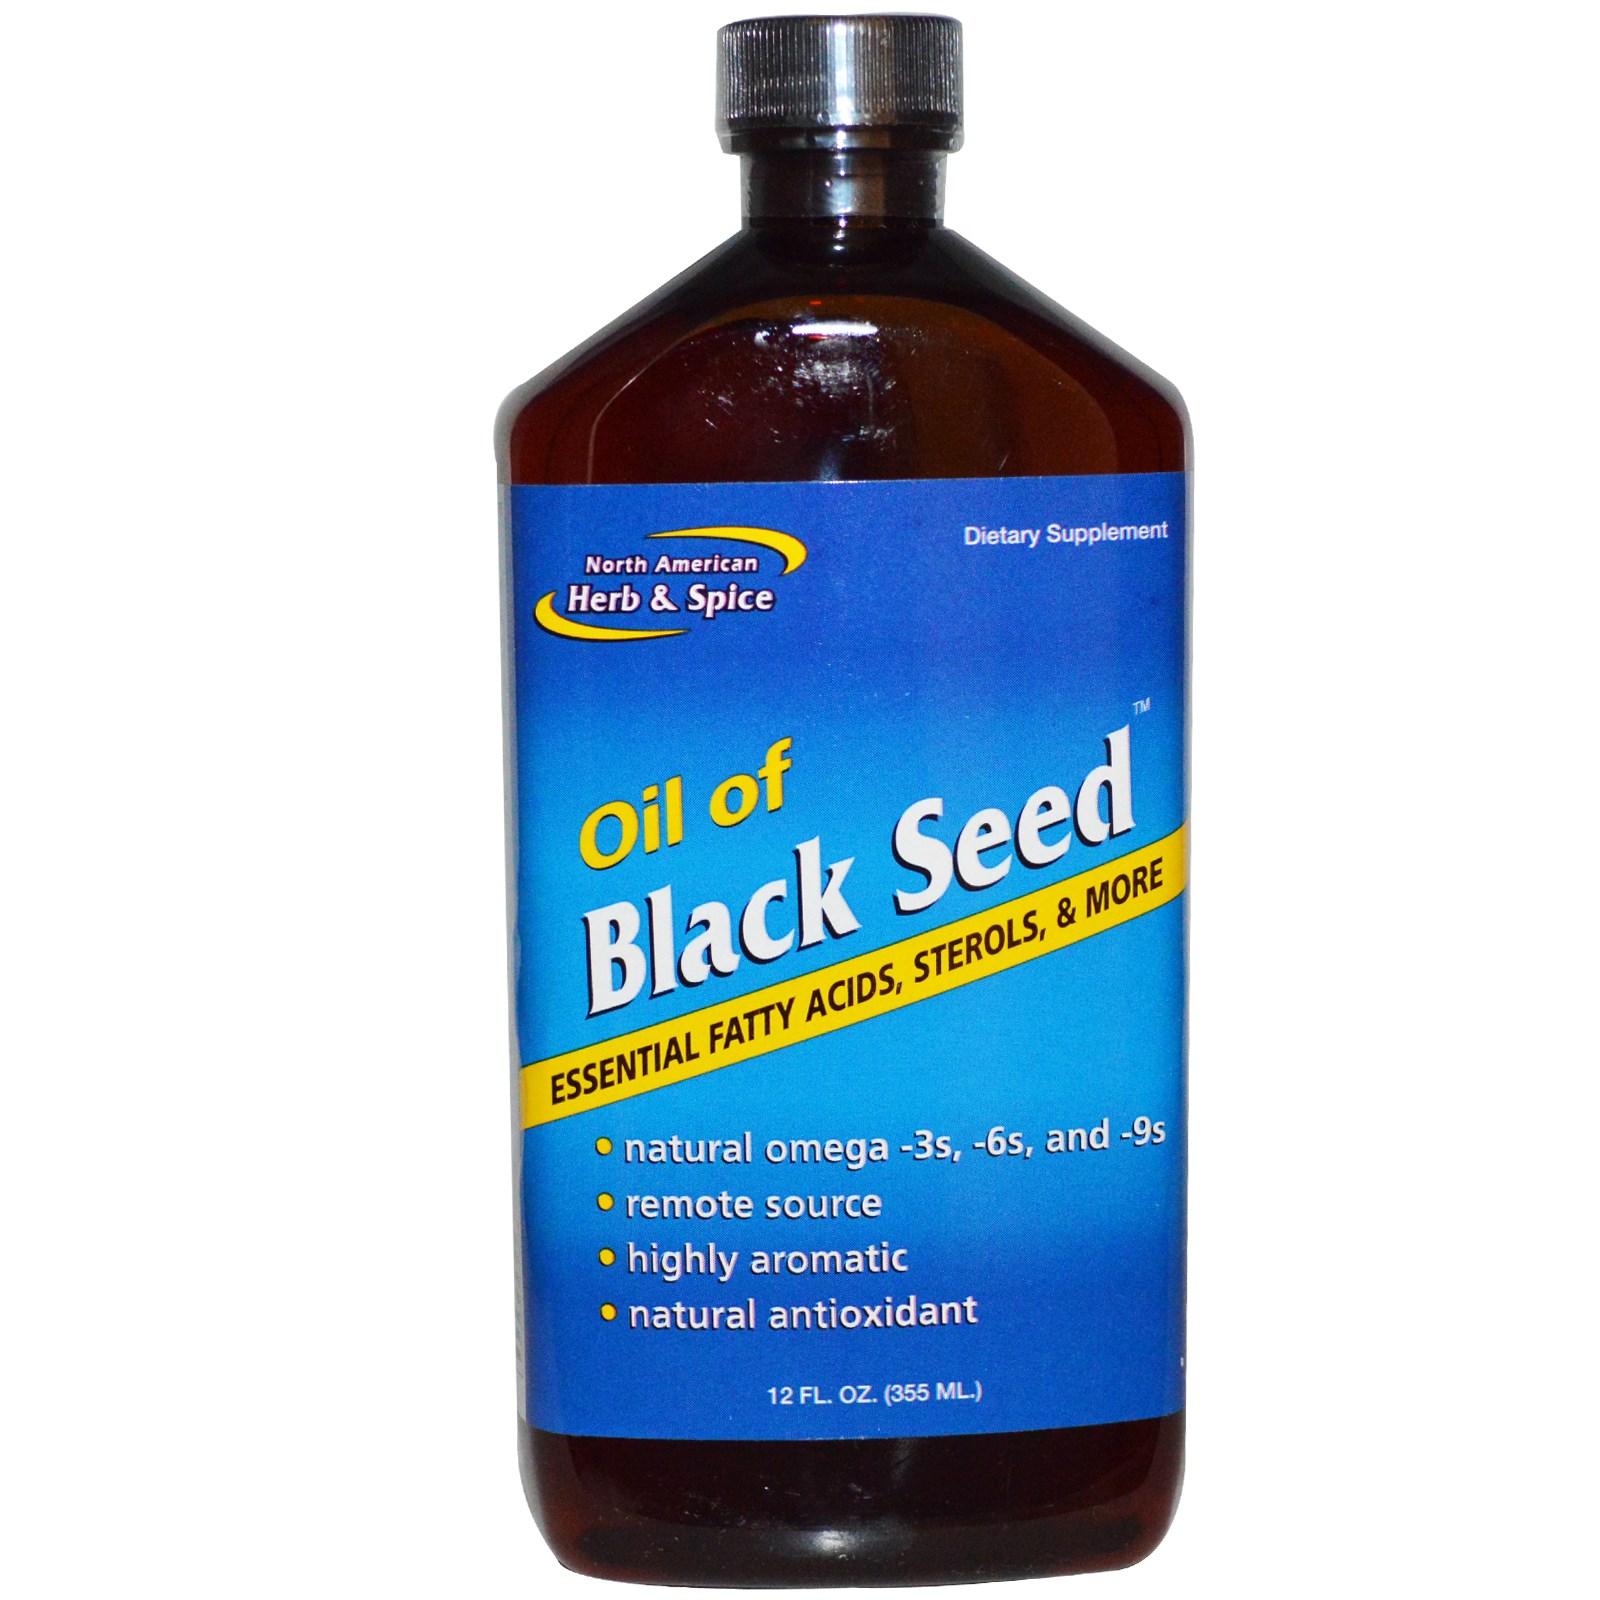 North American Herb & Spice Co в жидкой форме